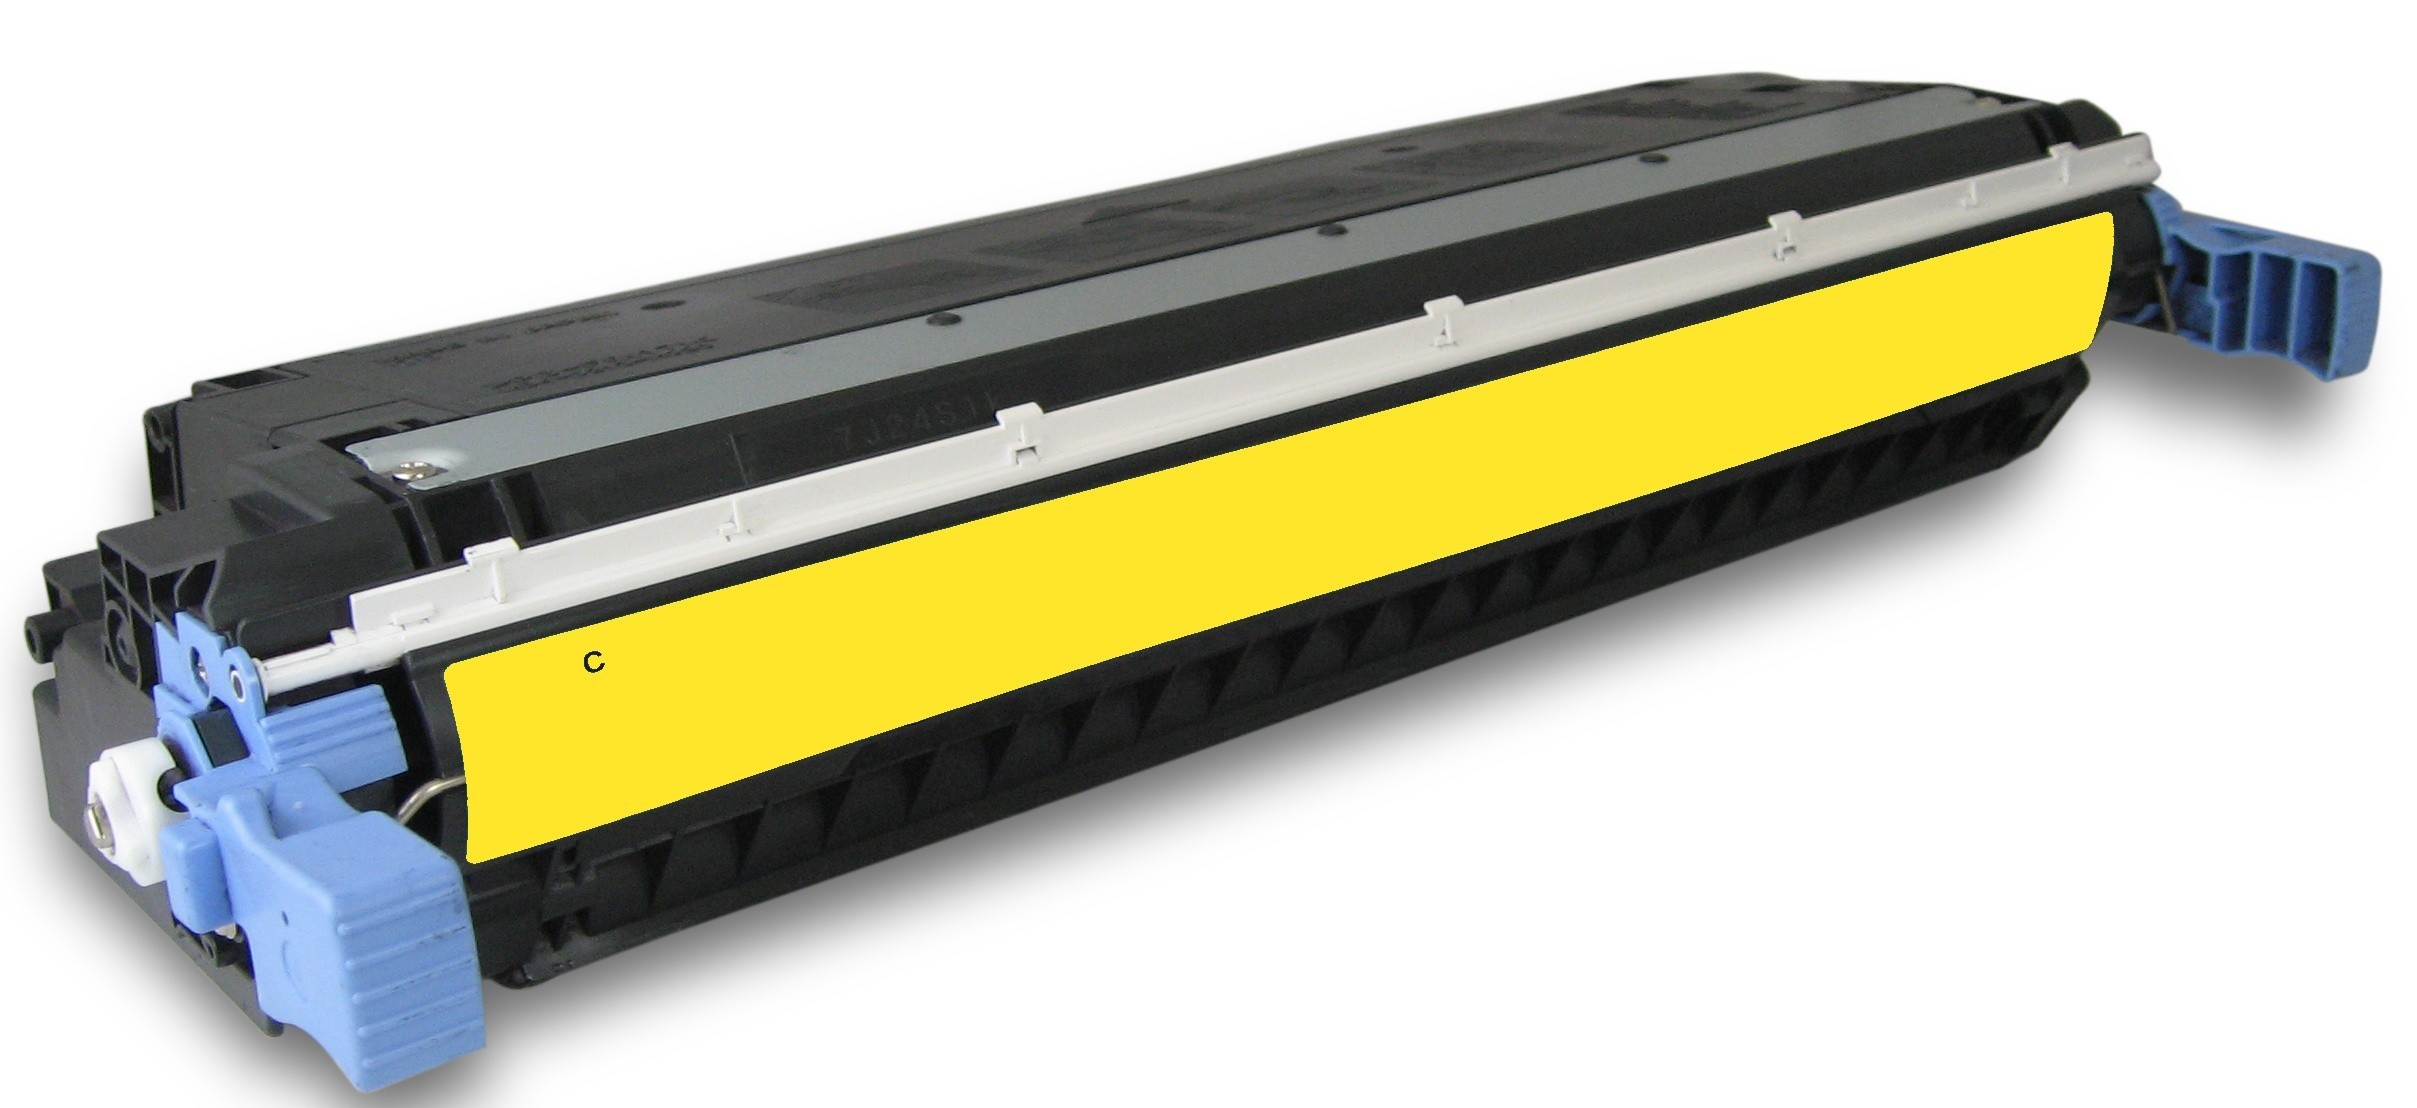 Cartus Toner Crg-711 Yellow Compatibil Canon